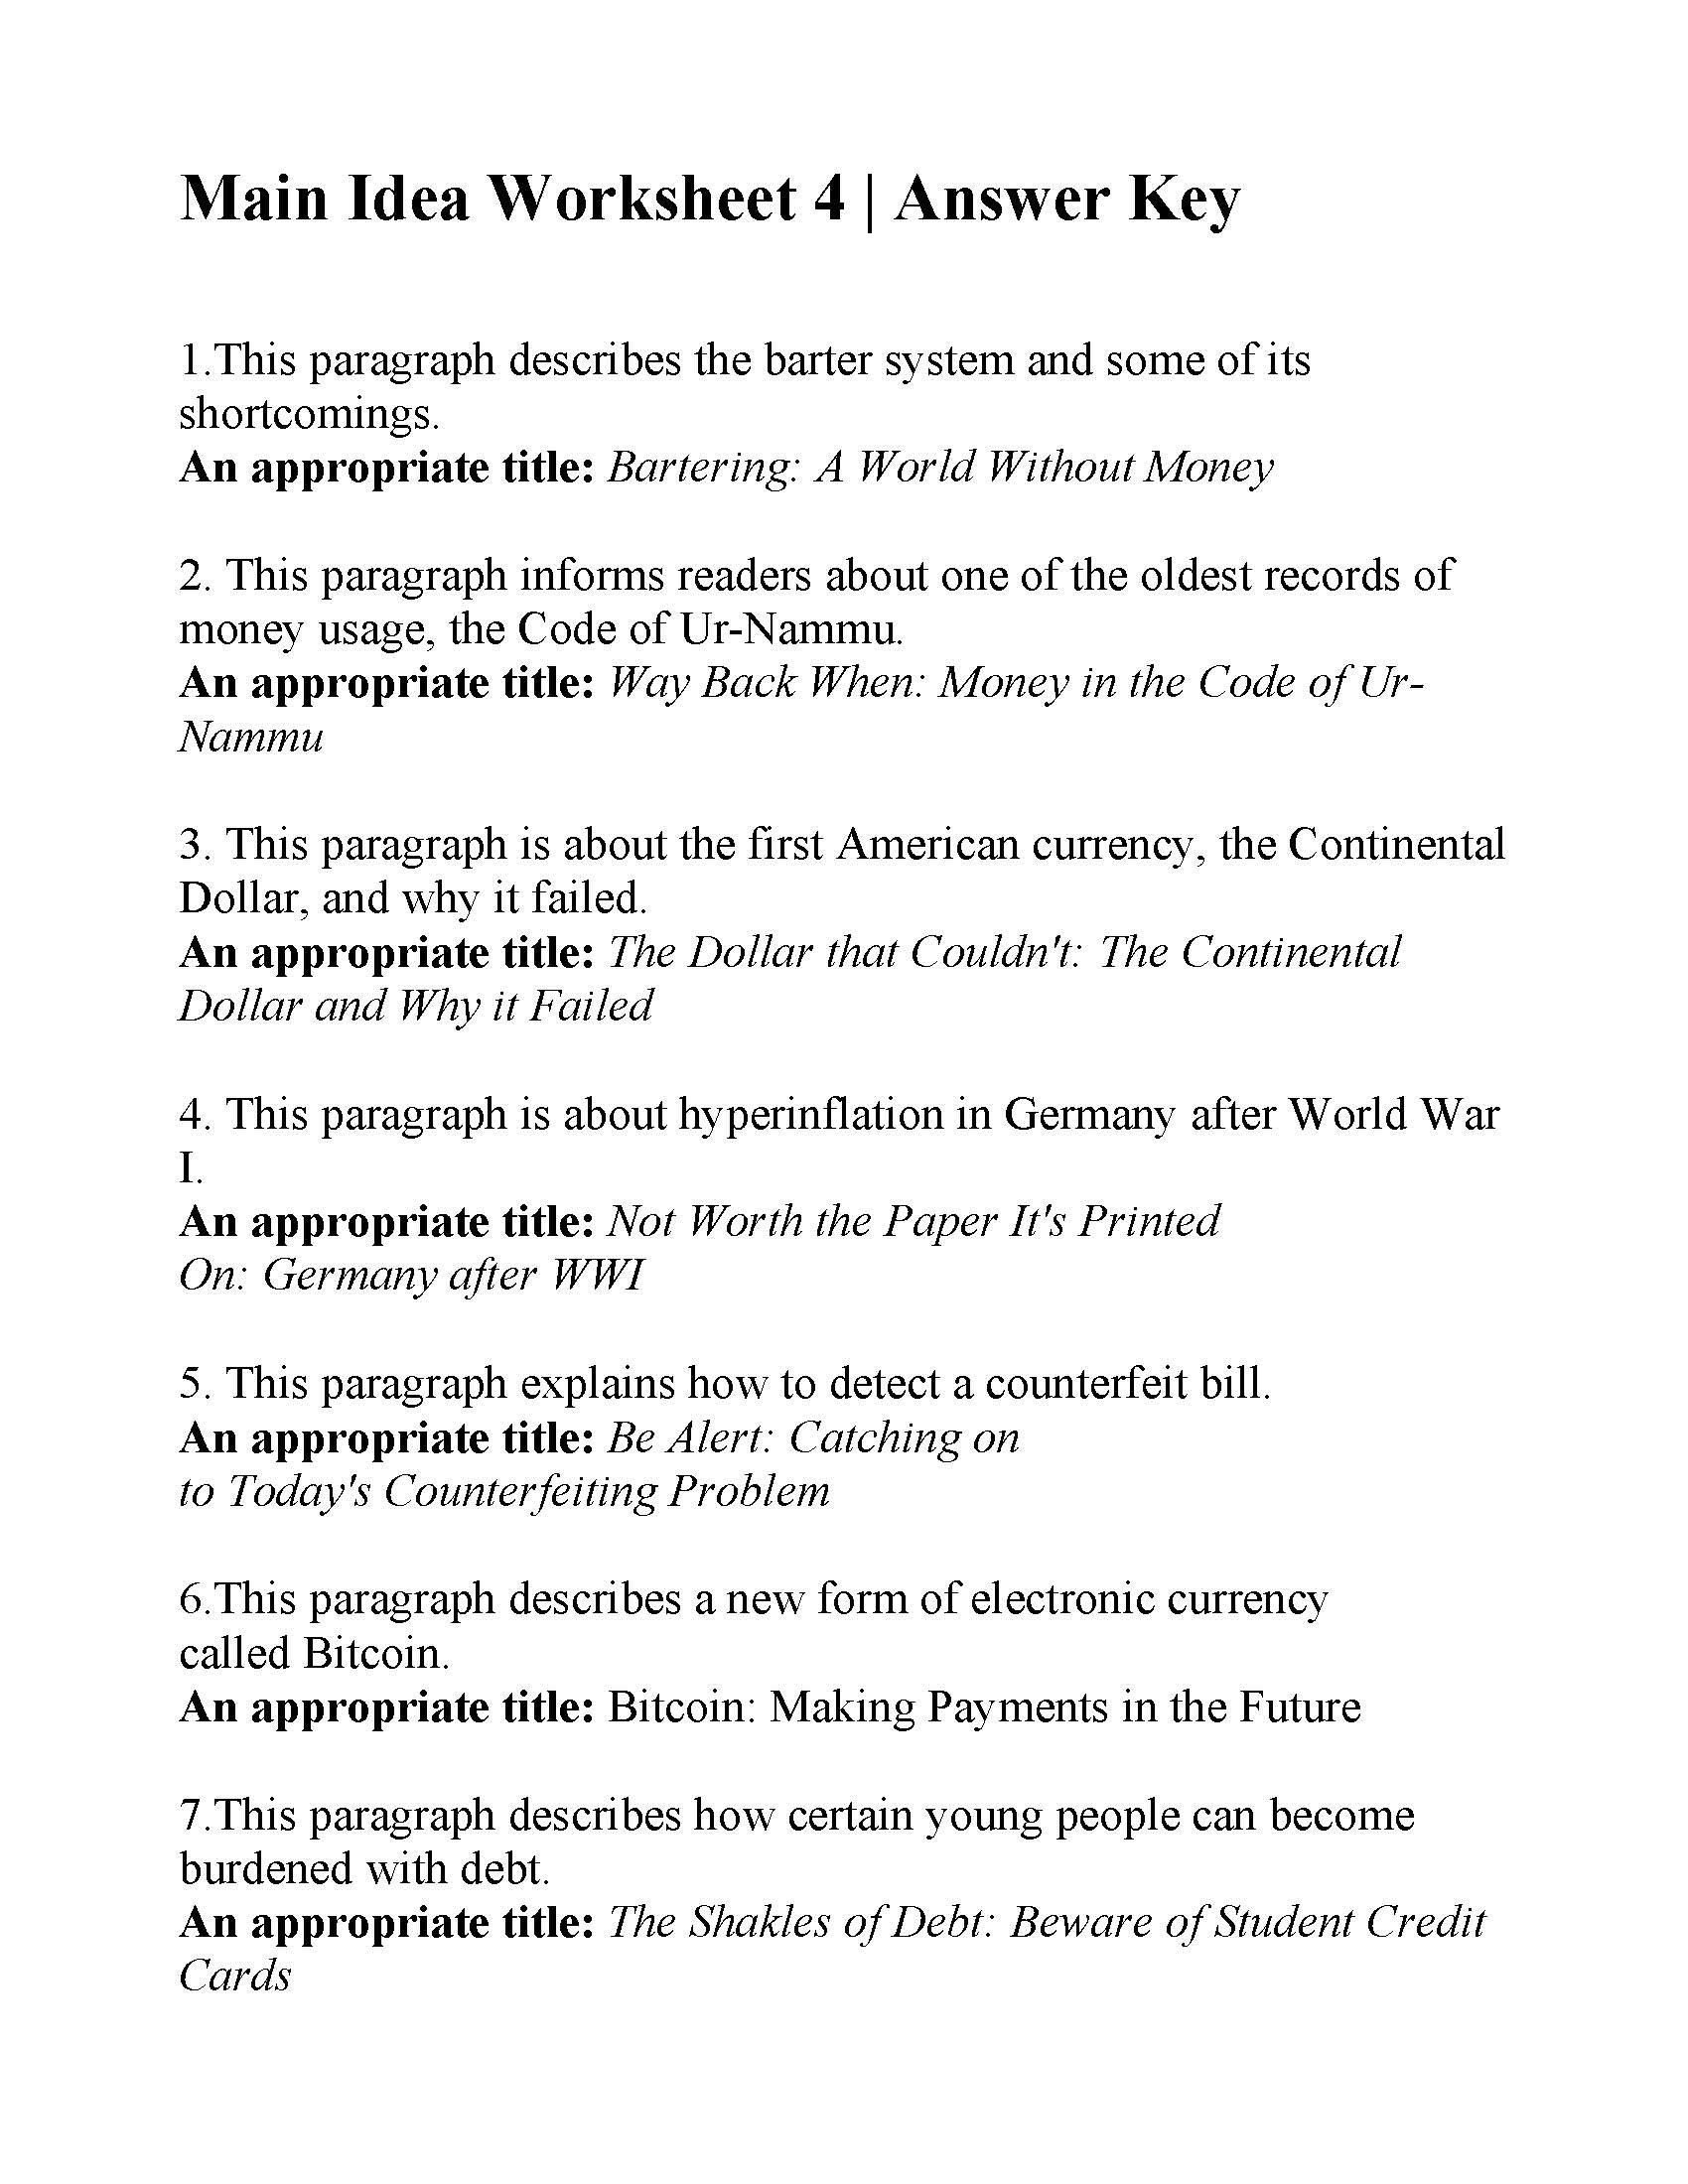 3rd Grade Main Idea Worksheets Main Idea Worksheets 5th